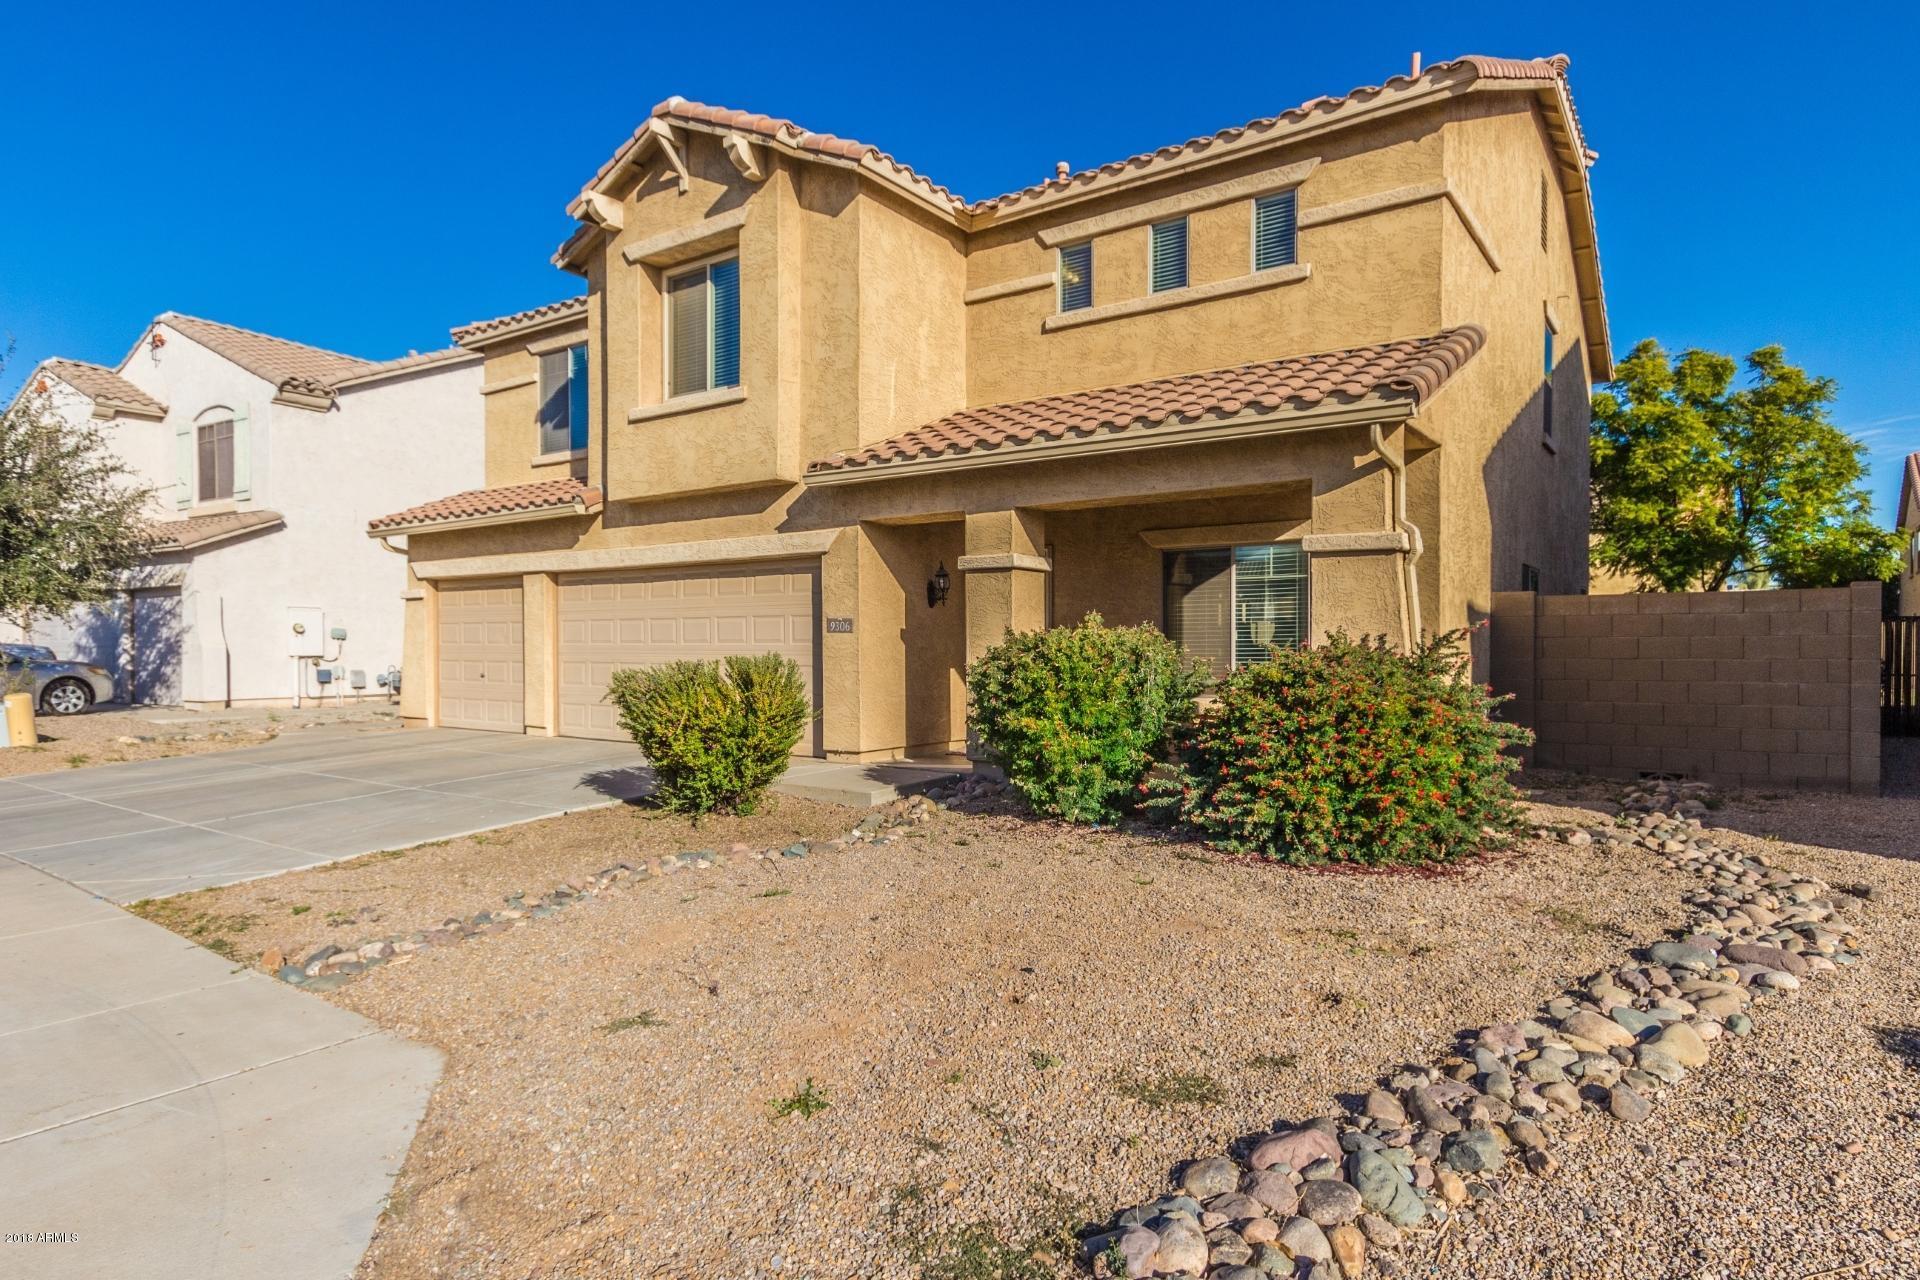 Photo of 9306 W BONITOS Road, Phoenix, AZ 85037